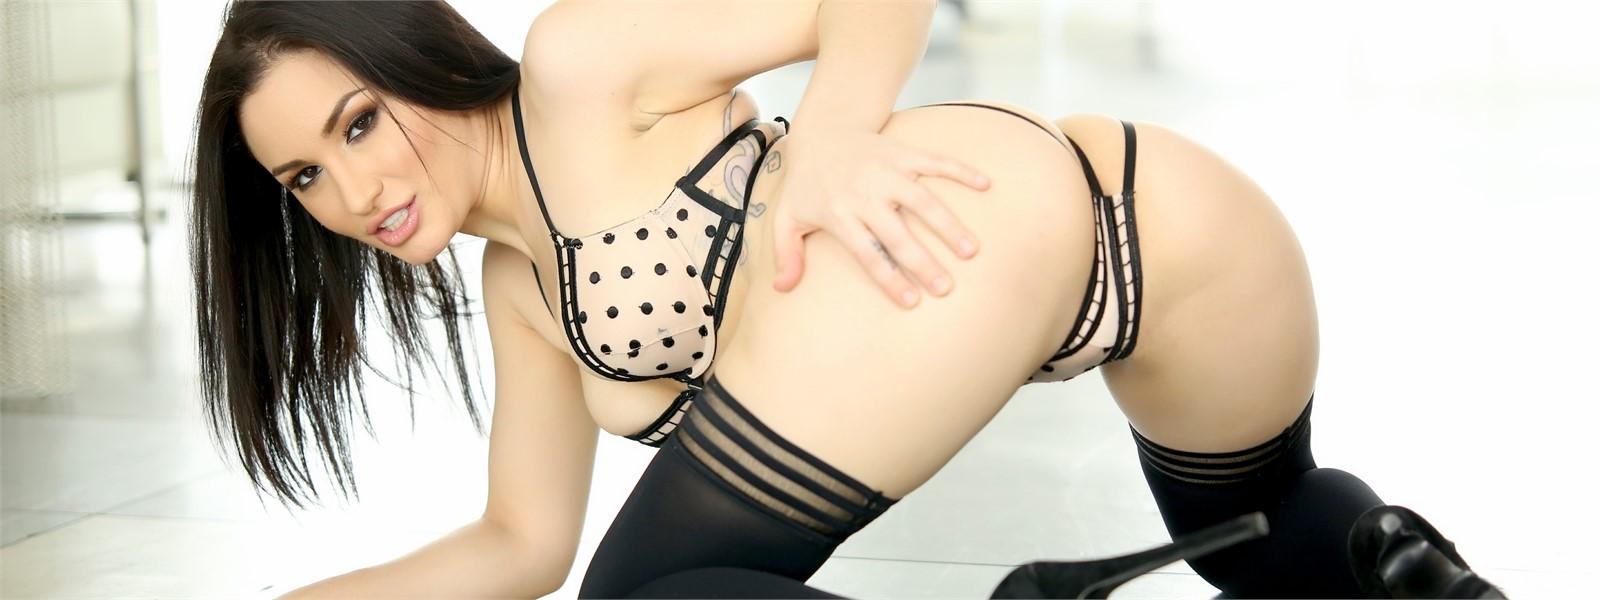 Gear knob pussy insertion